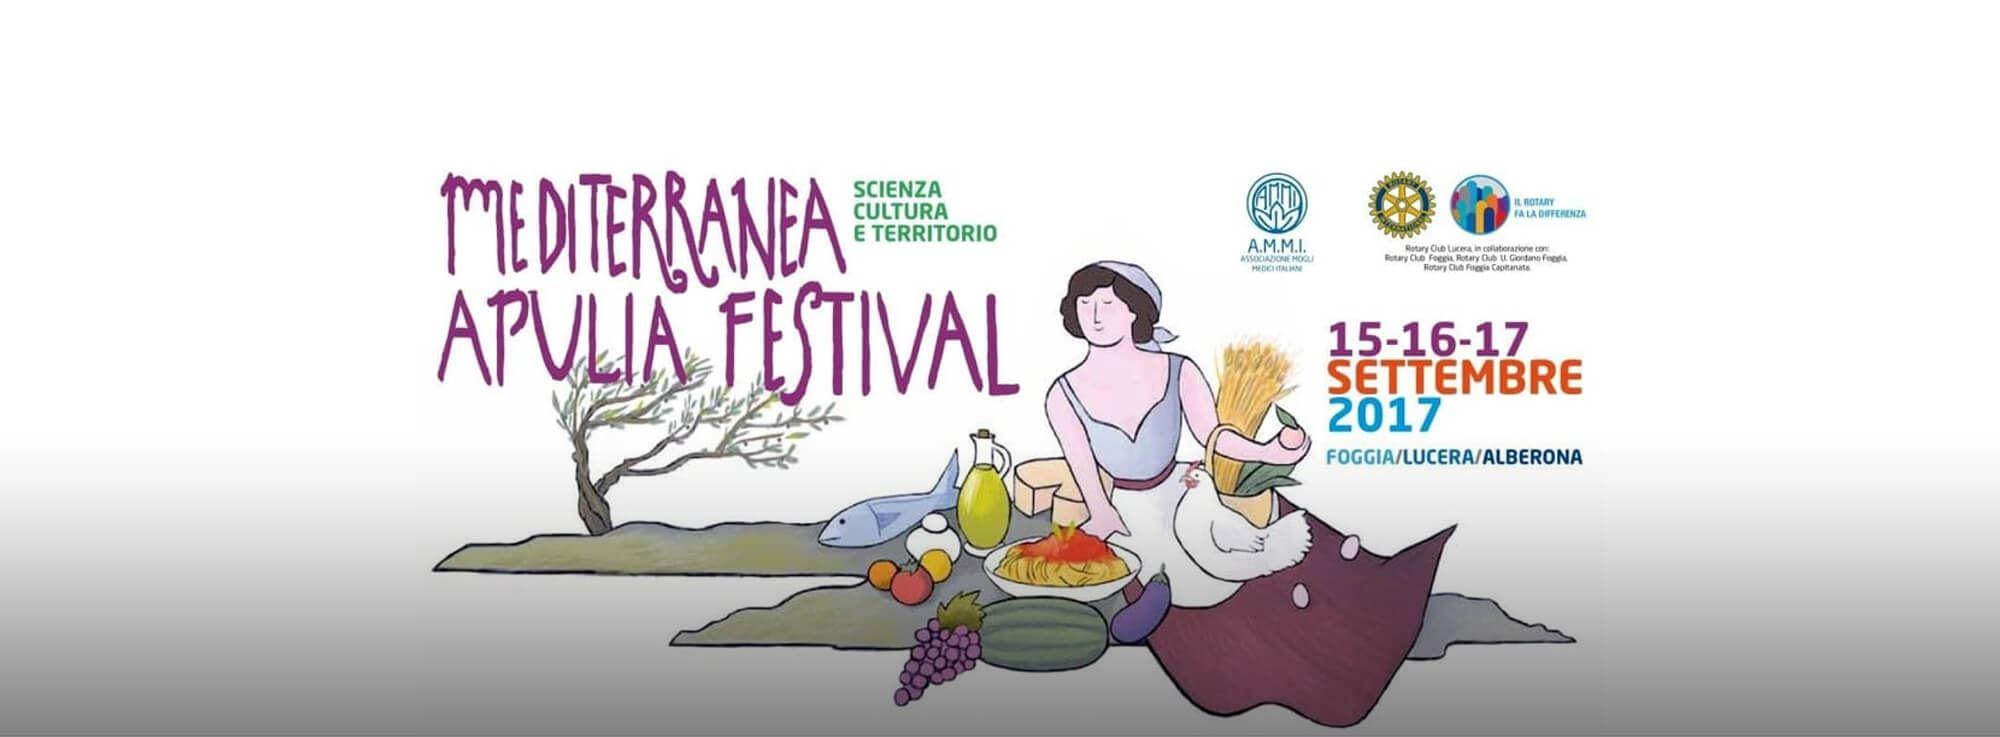 Foggia, Lucera, Alberona: Mediterranea Apulia Festival